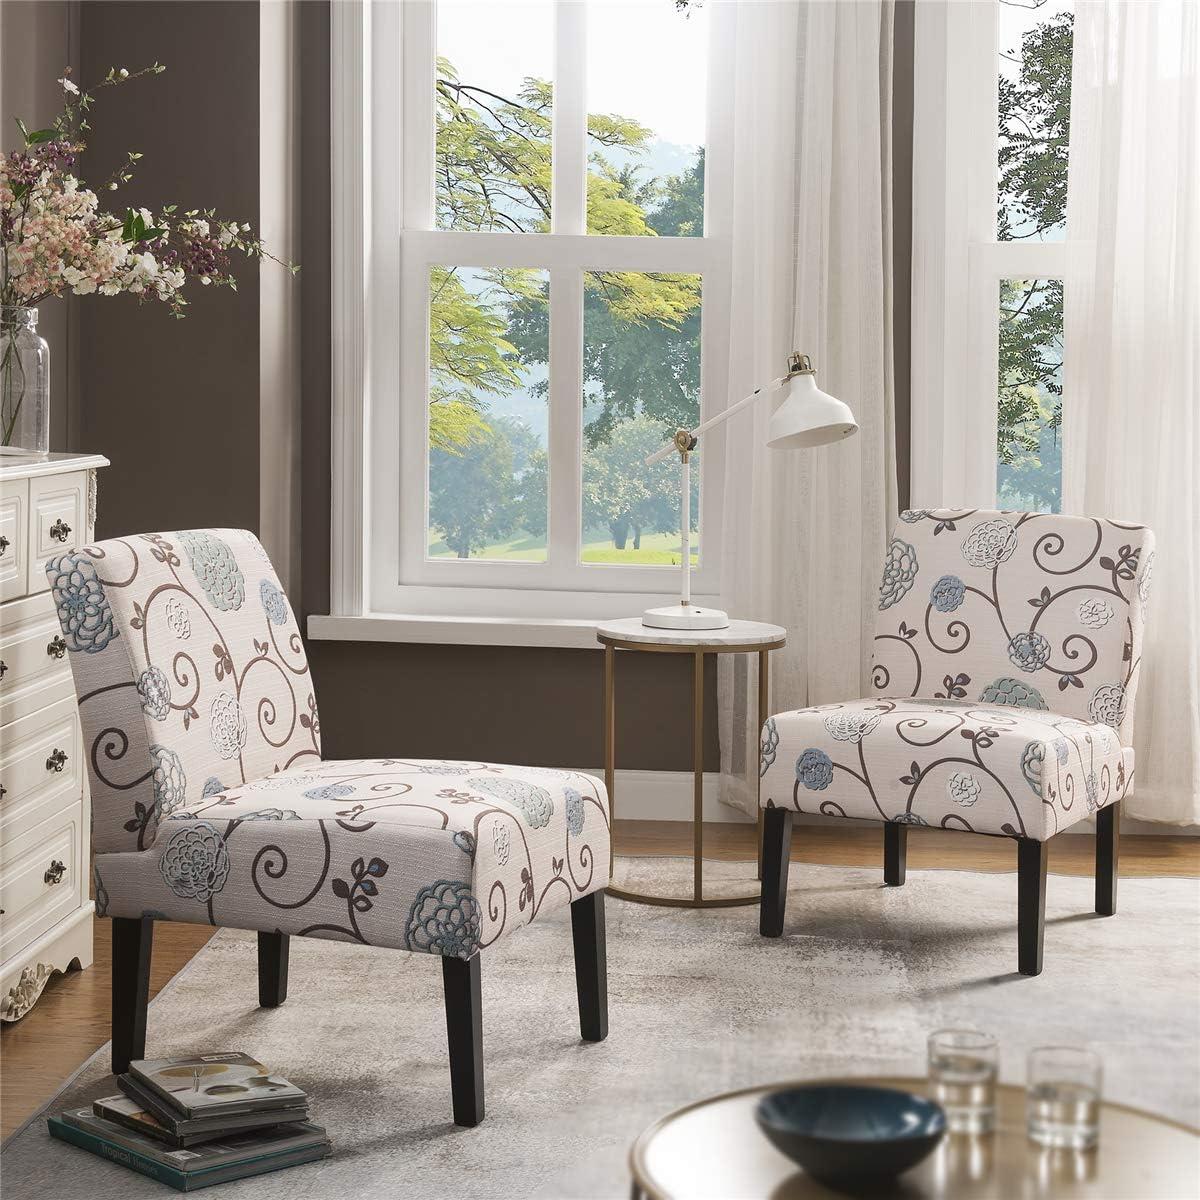 Family Life Modern Polyester Upholstered Print Fabric Armless Accent Chair Set of 2, Rivoli Slipper Chair for Living Room